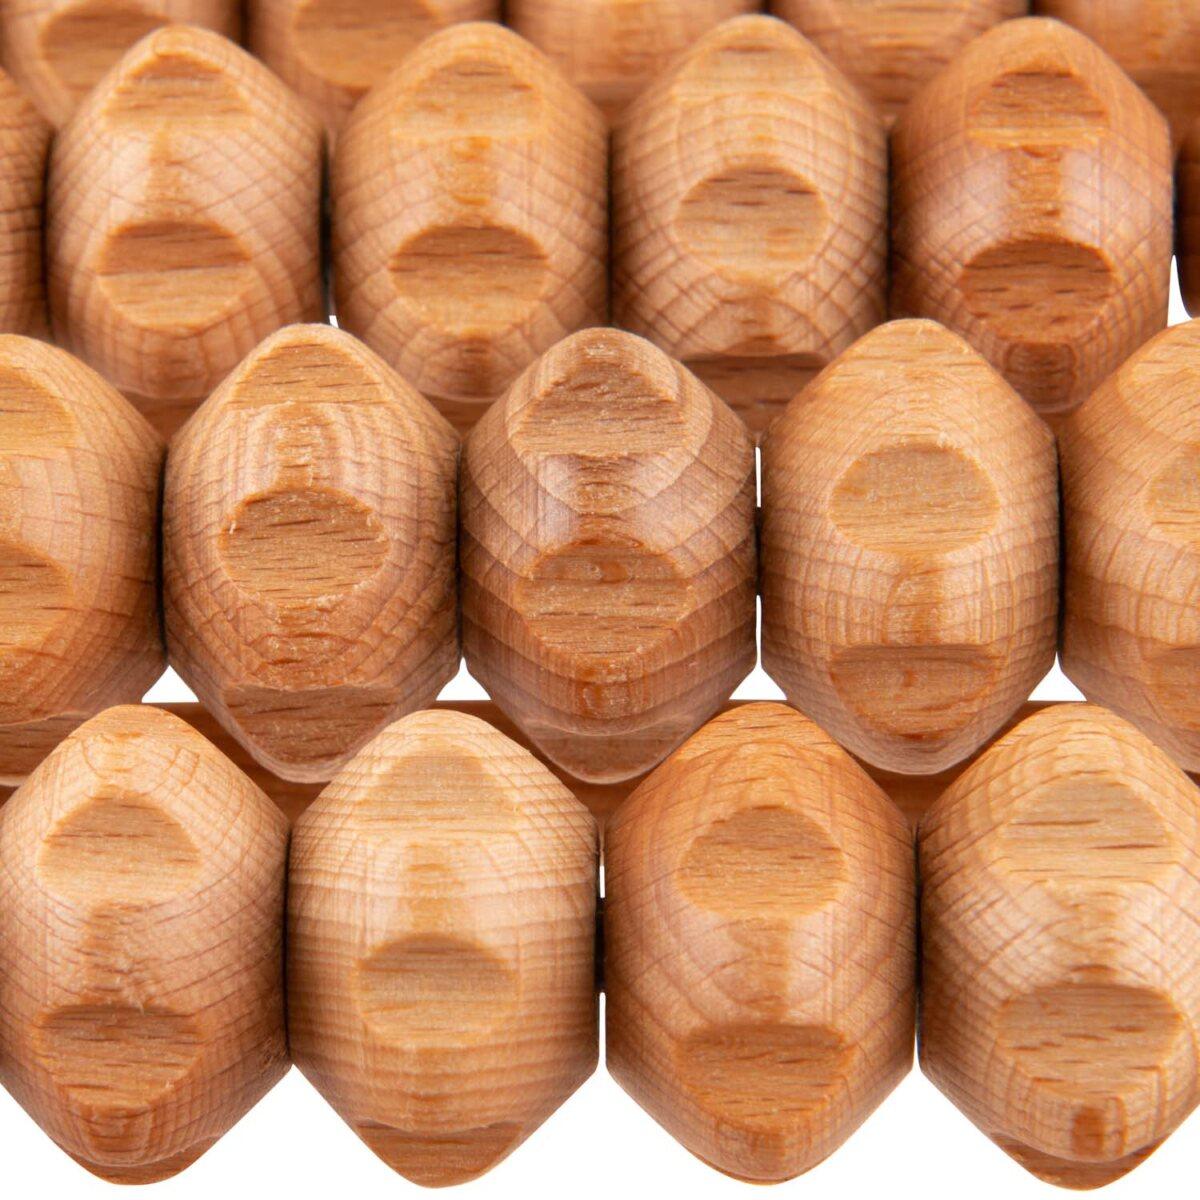 wooden foot massage tool